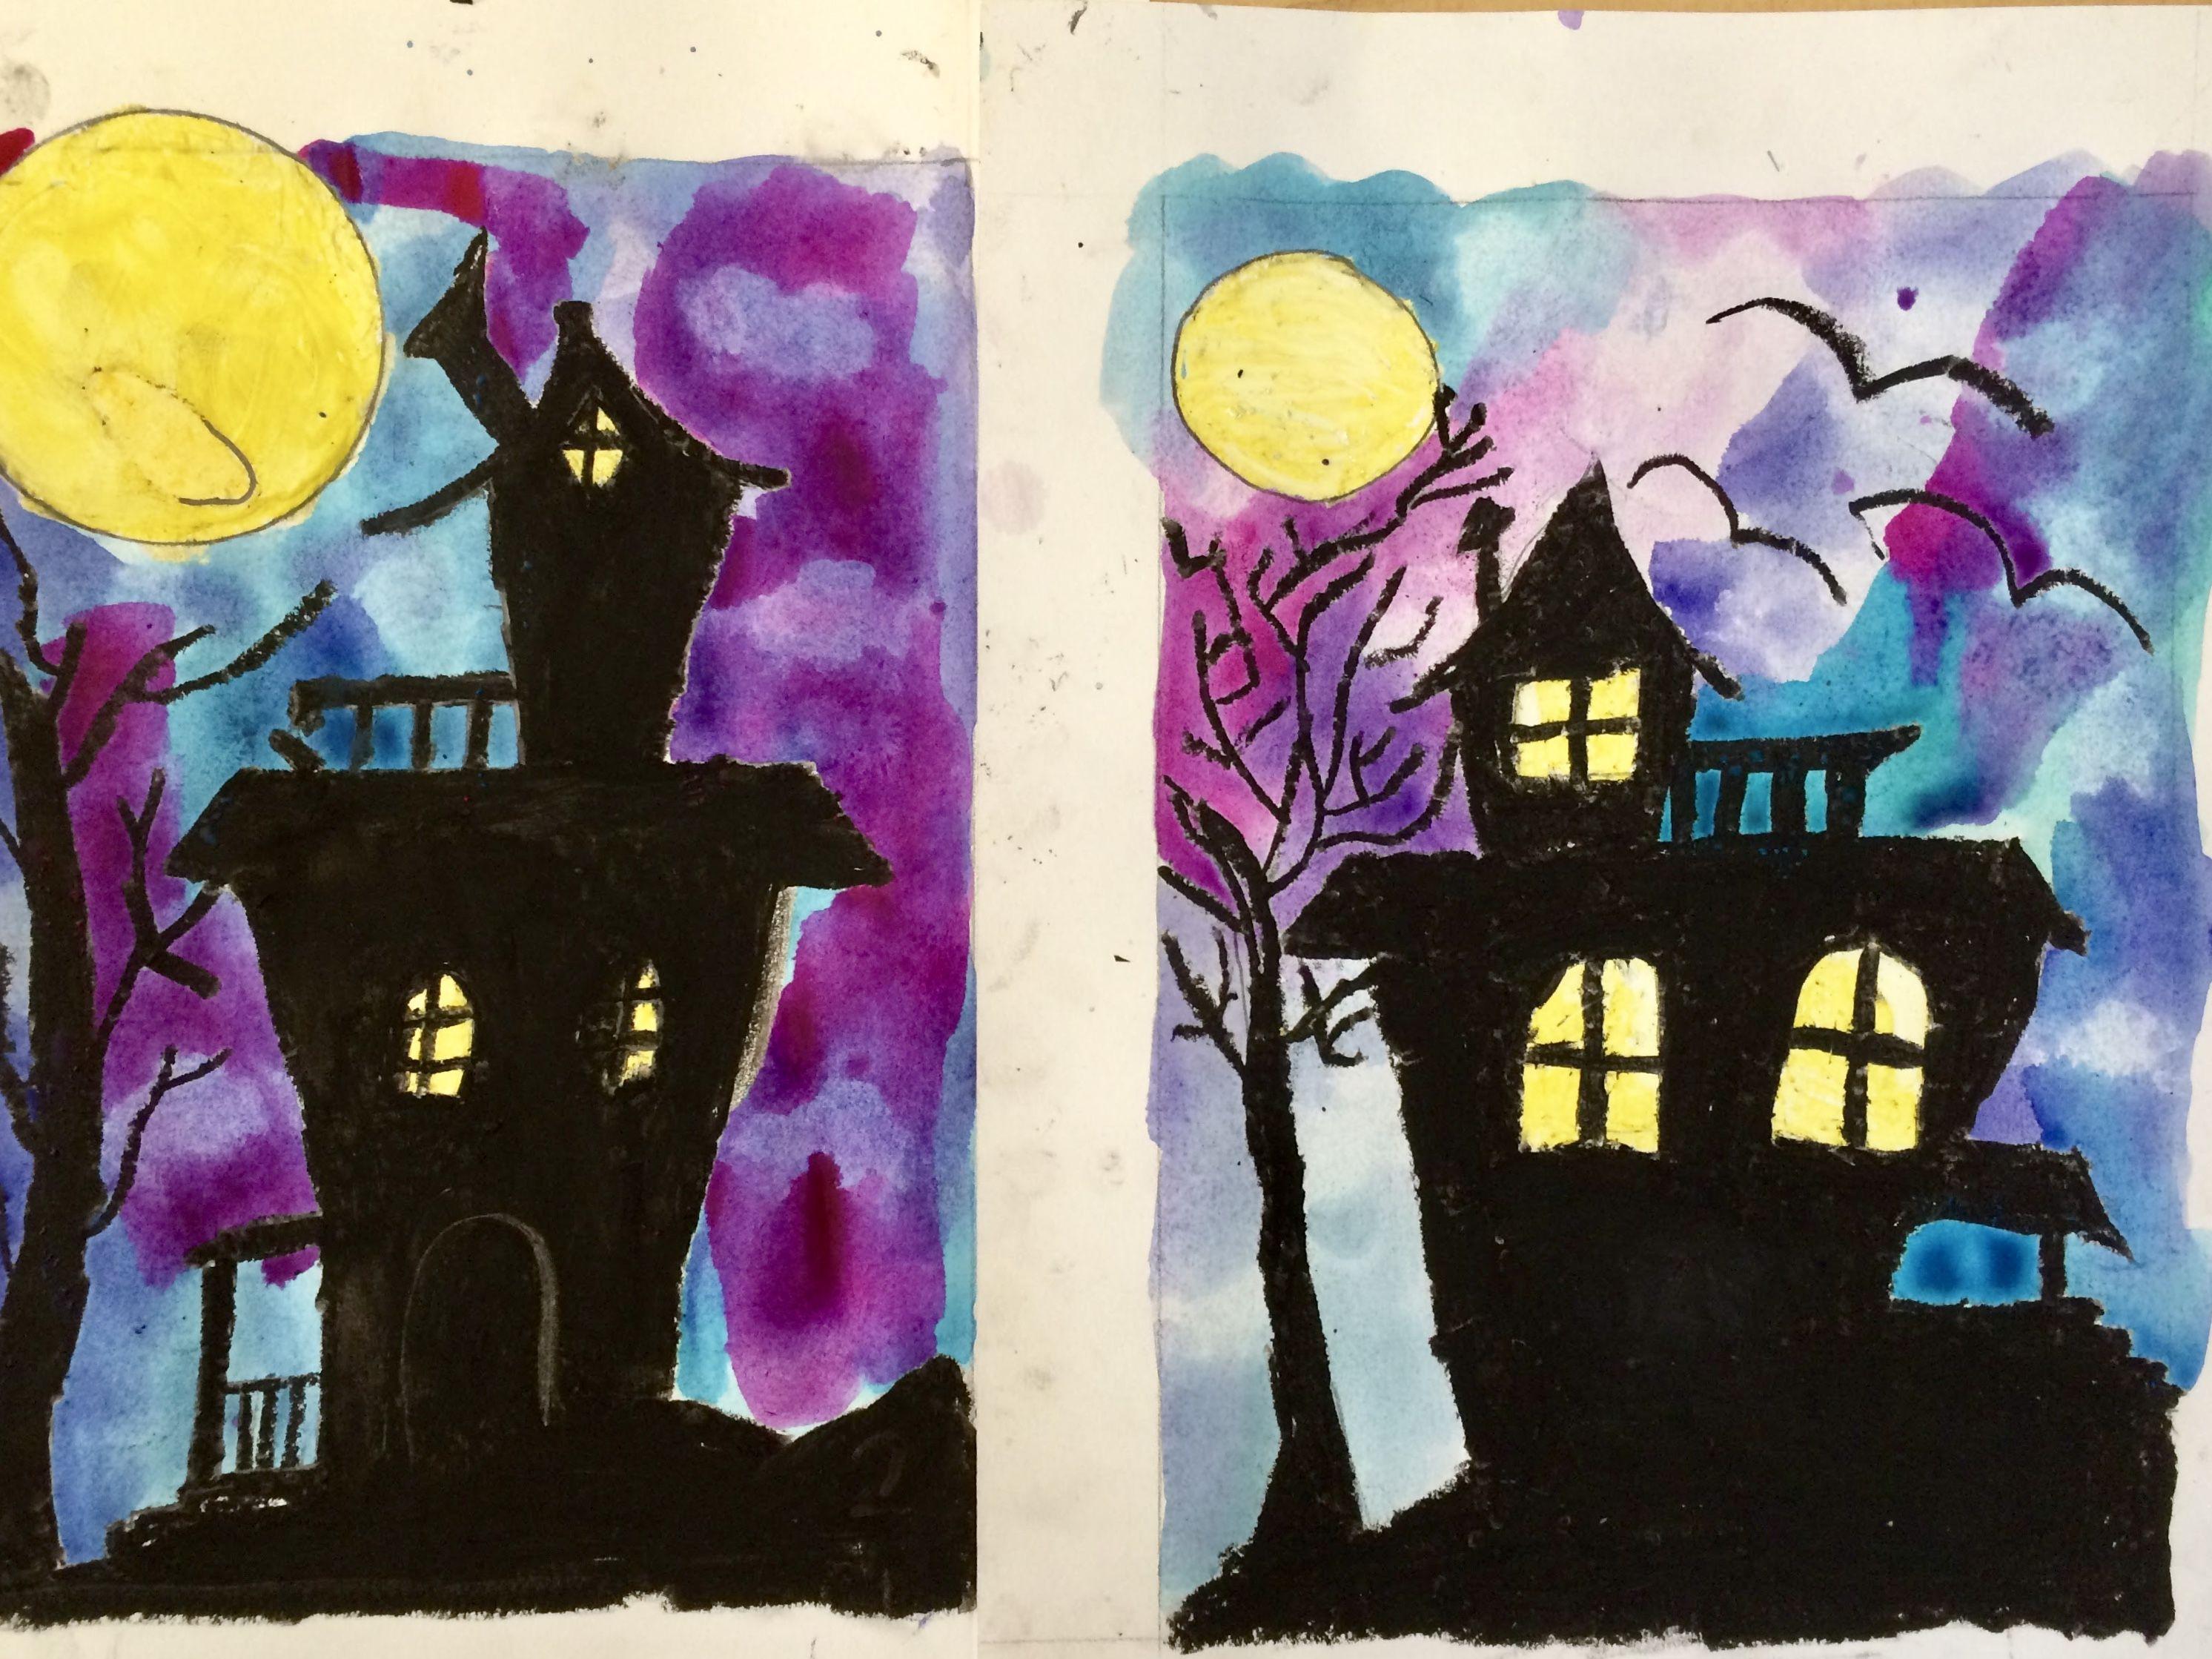 Original Plans For Halloween 2020 Spooky House Halloween Art Lesson by Art Teacher in LA Art | Etsy